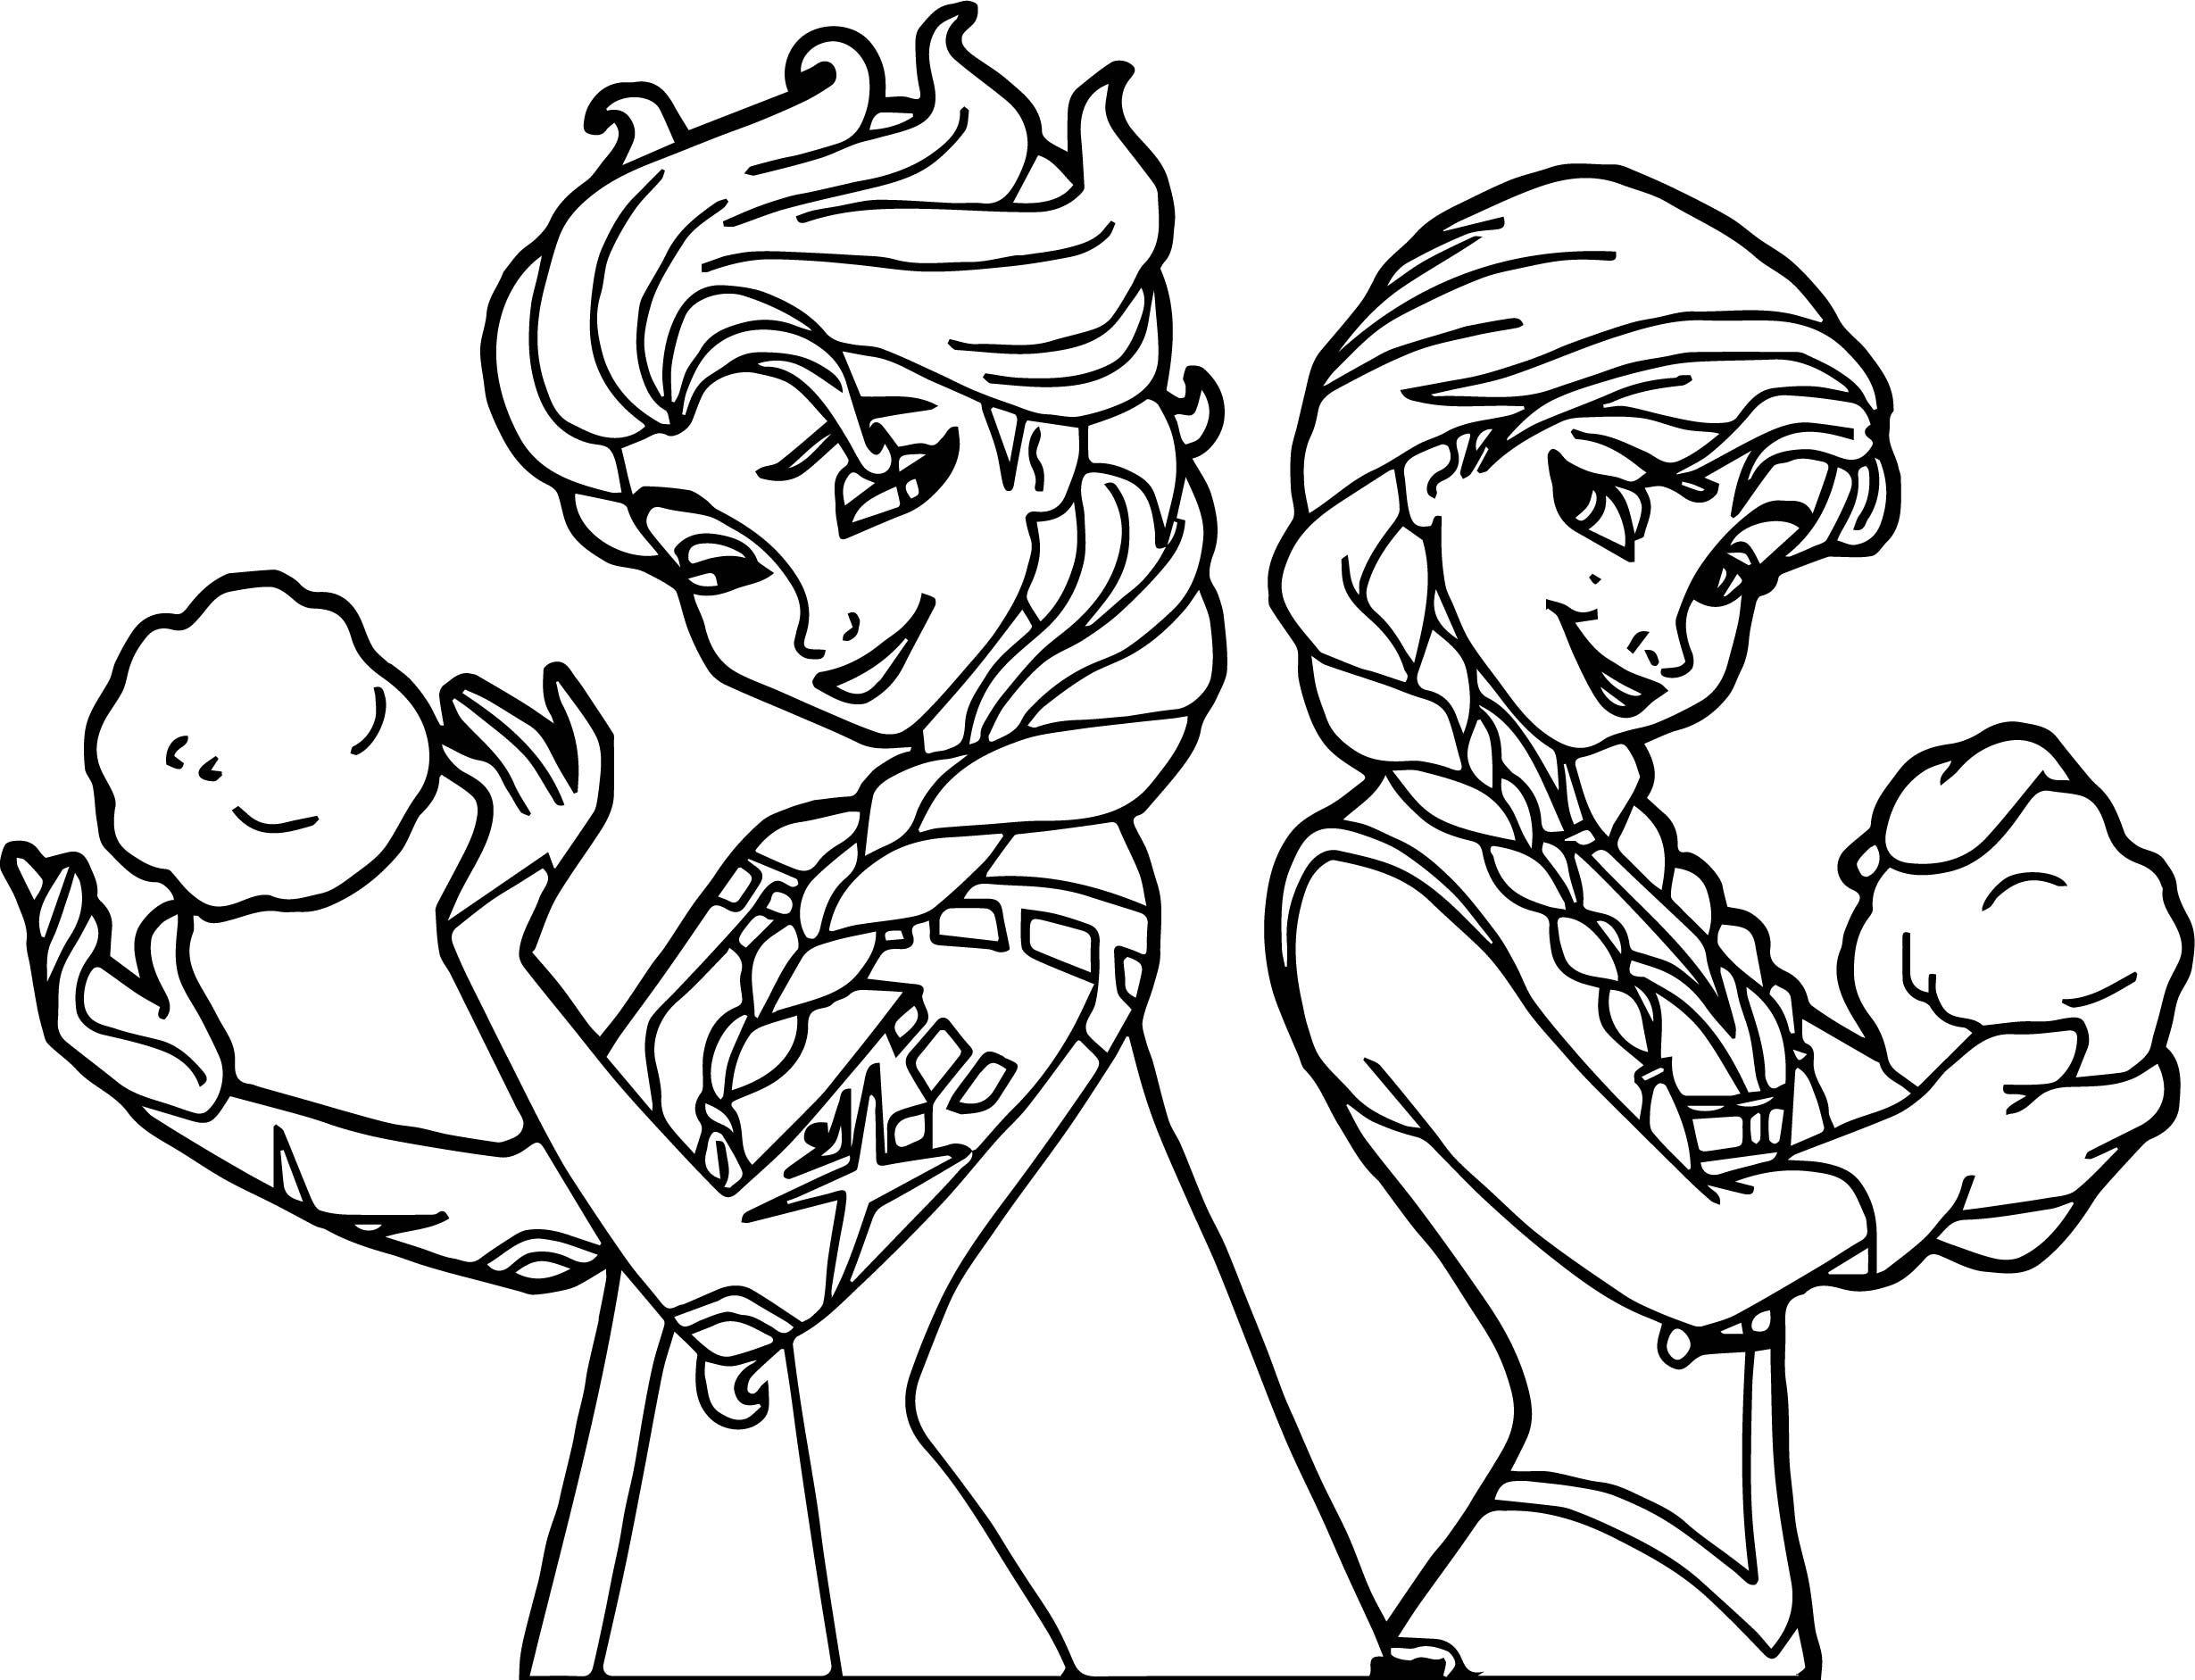 Cool Elsa Anna Snowballs Coloring Page Elsa Coloring Pages Disney Coloring Pages Frozen Coloring Pages